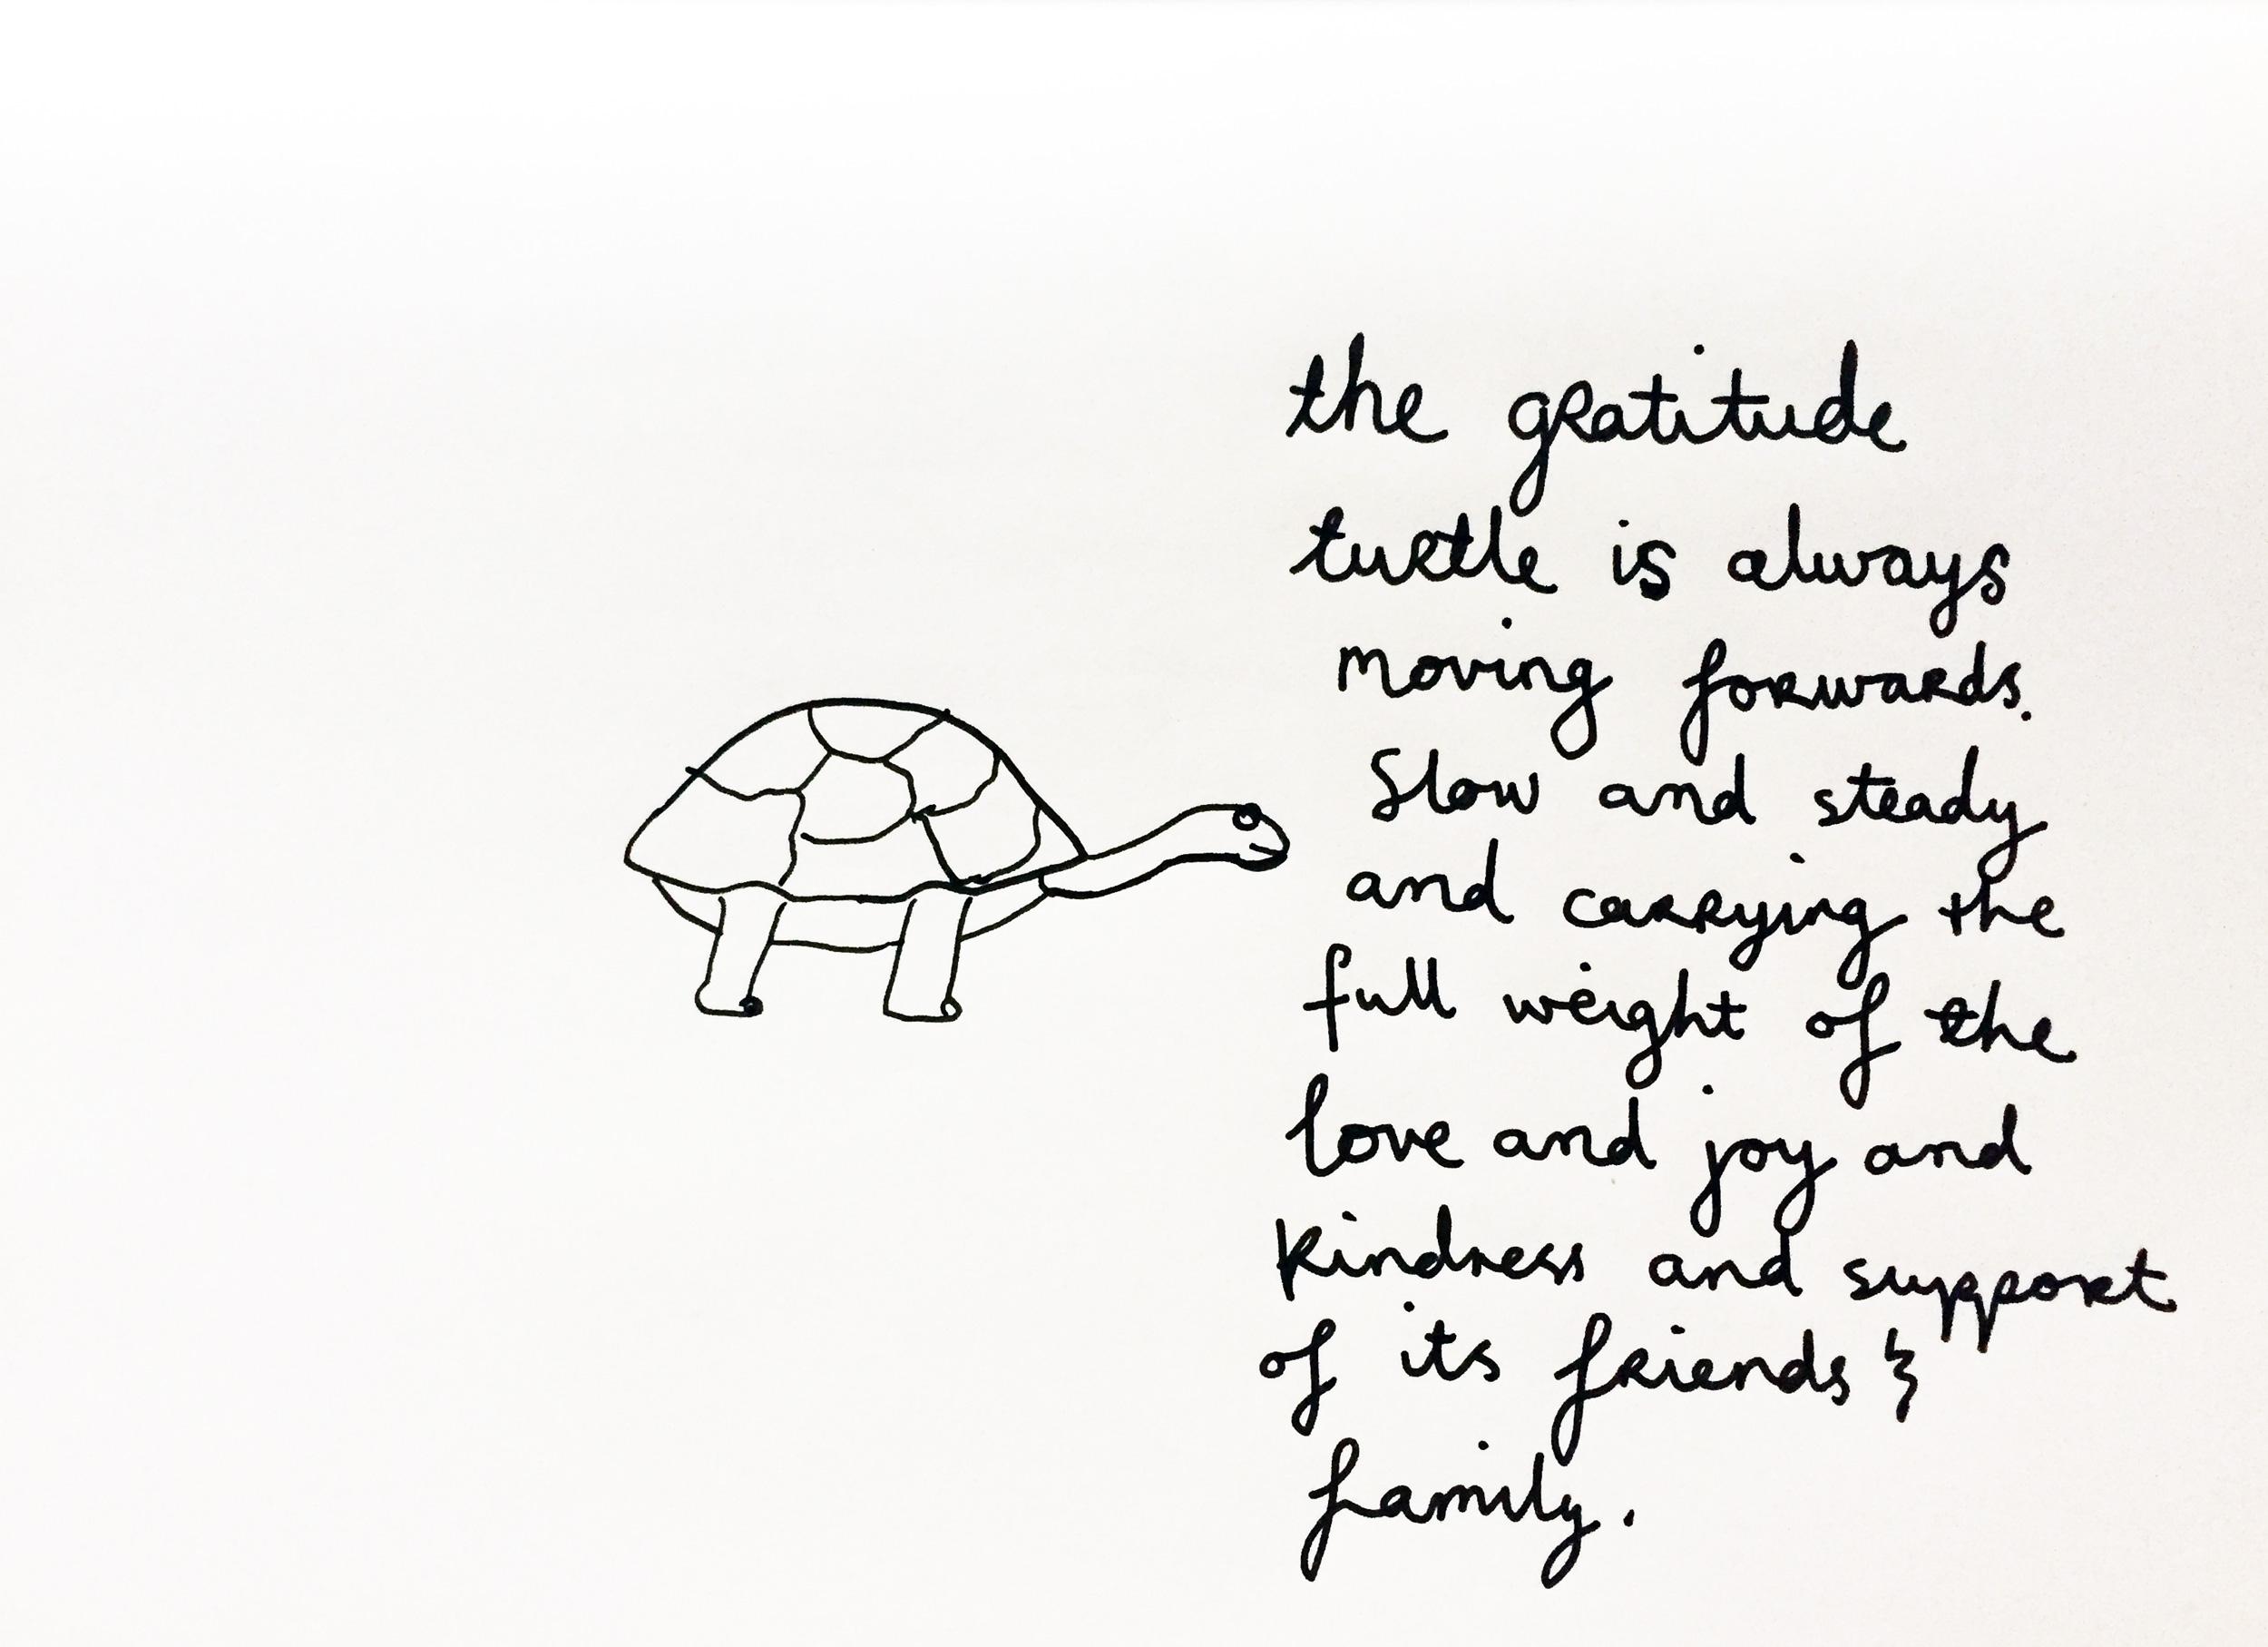 A grateful turtle. Drawing Luke Hockley.